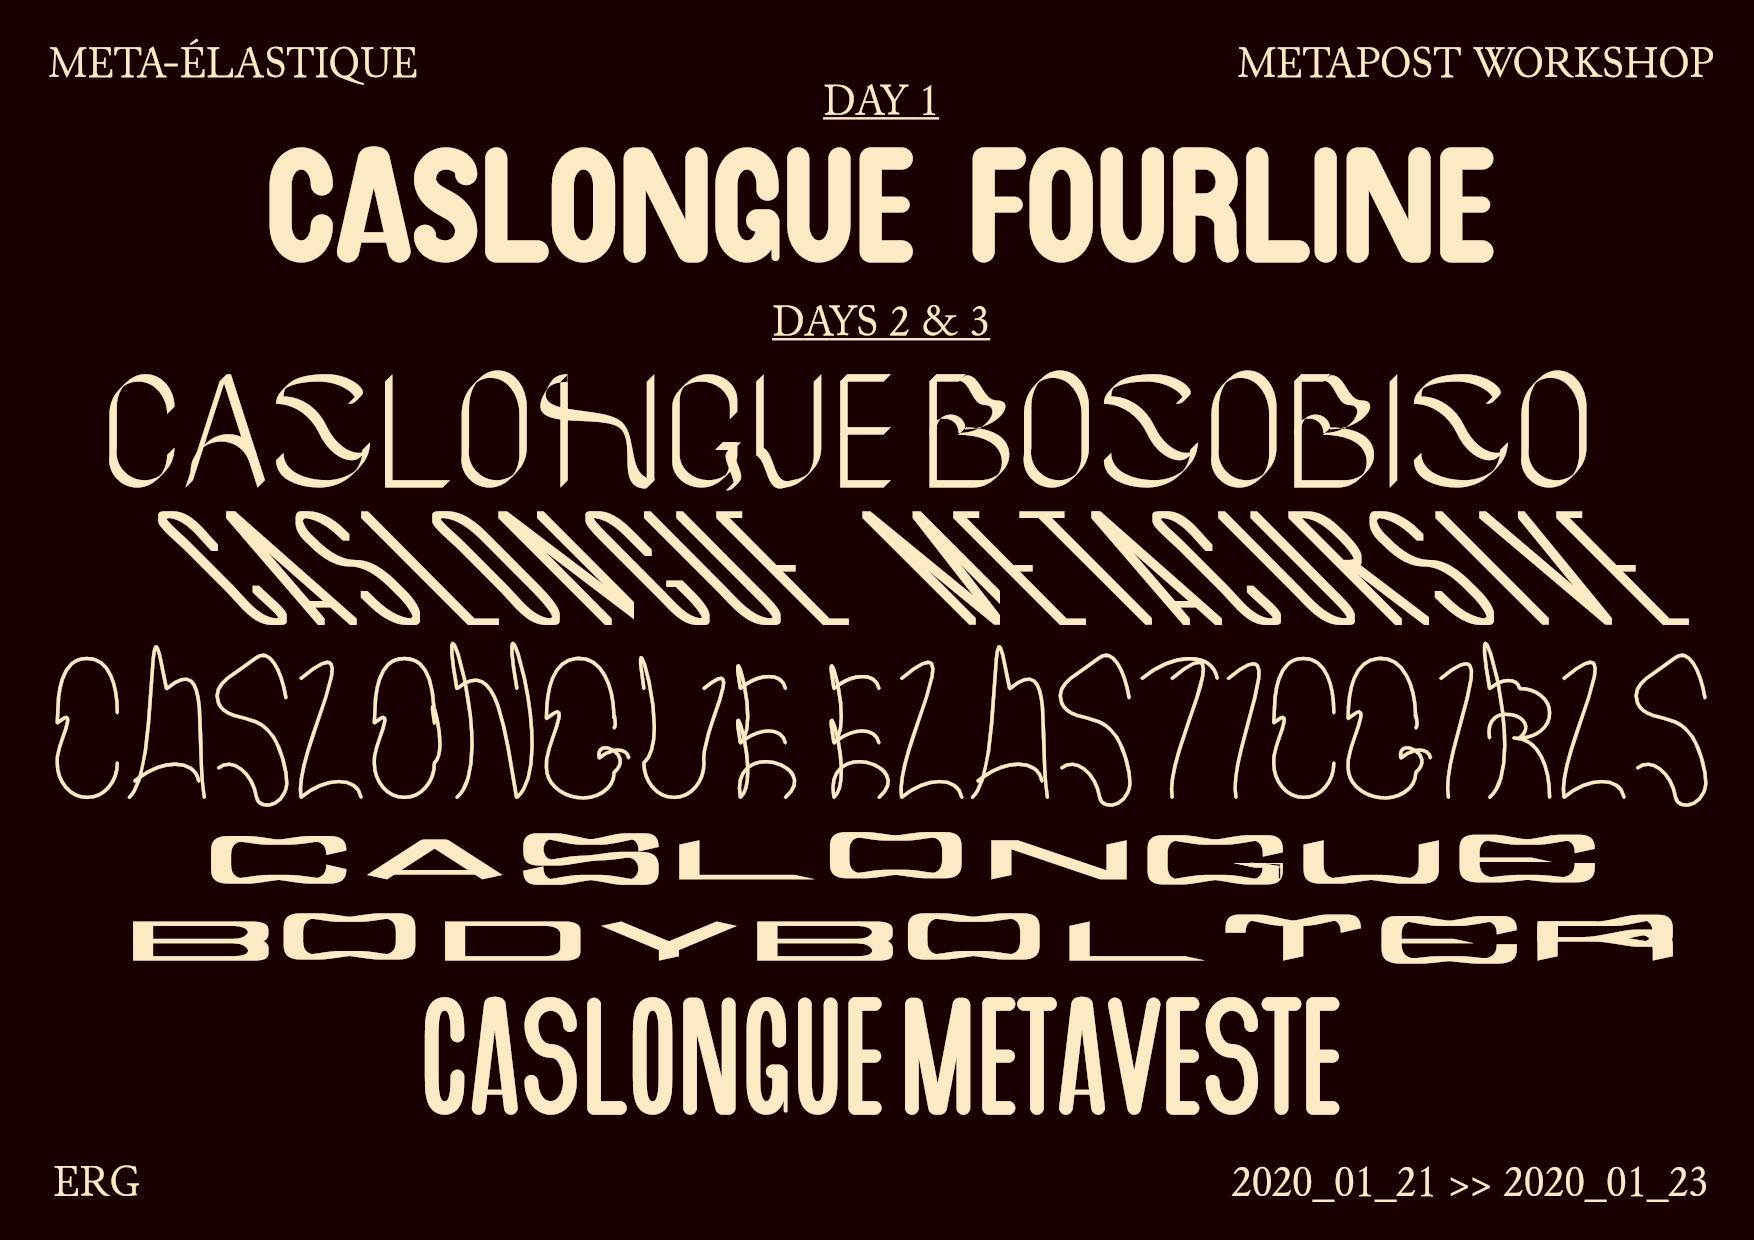 images/caslongue-specimen-alpha.png